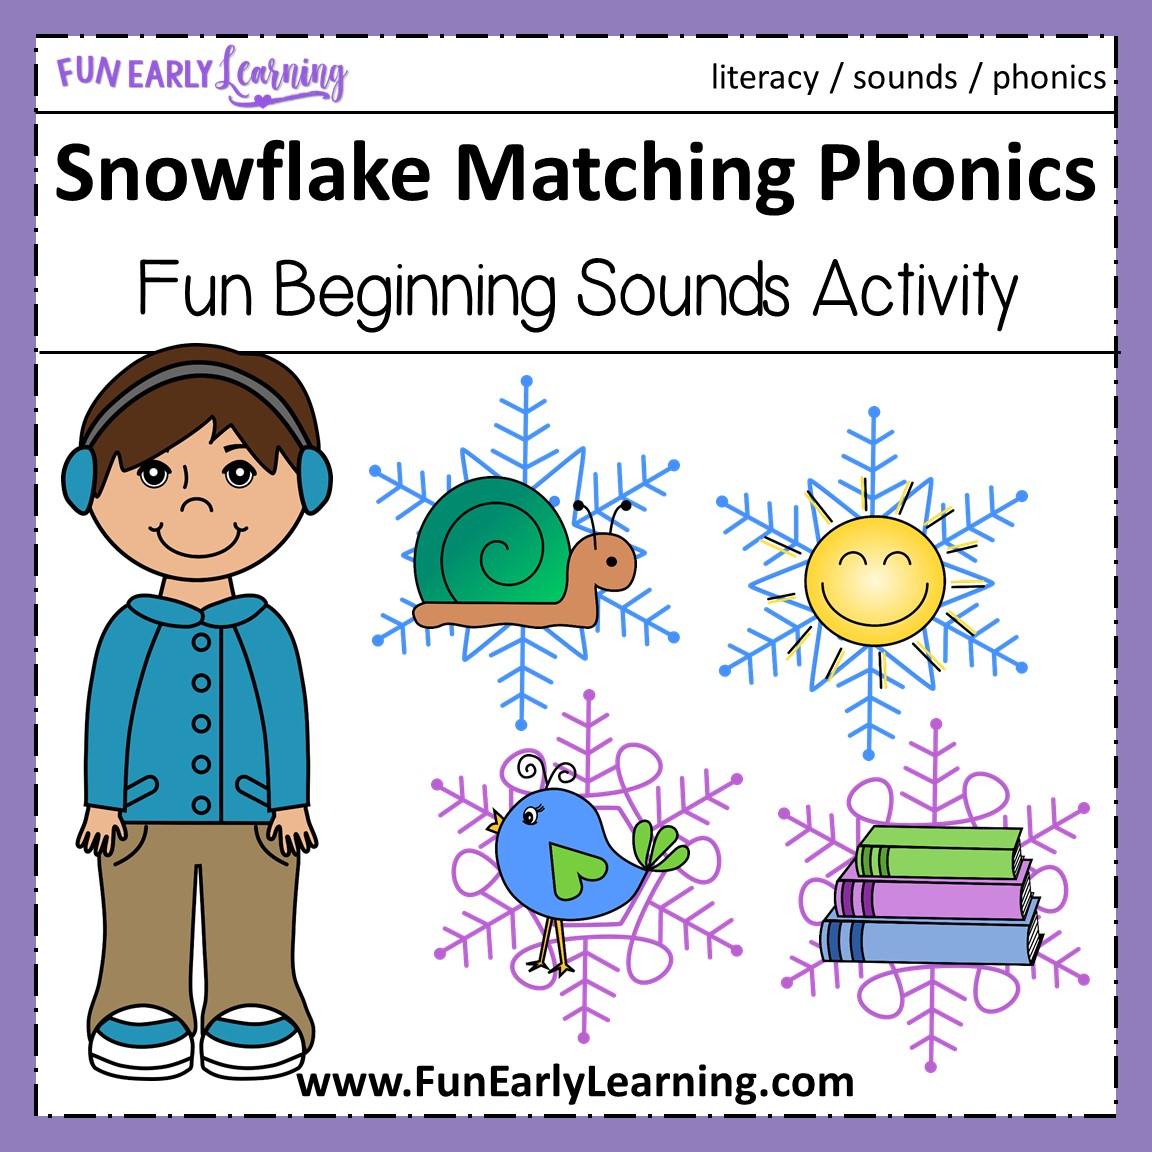 Winter Snowflake Matching Beginning Sounds Phonics Activity